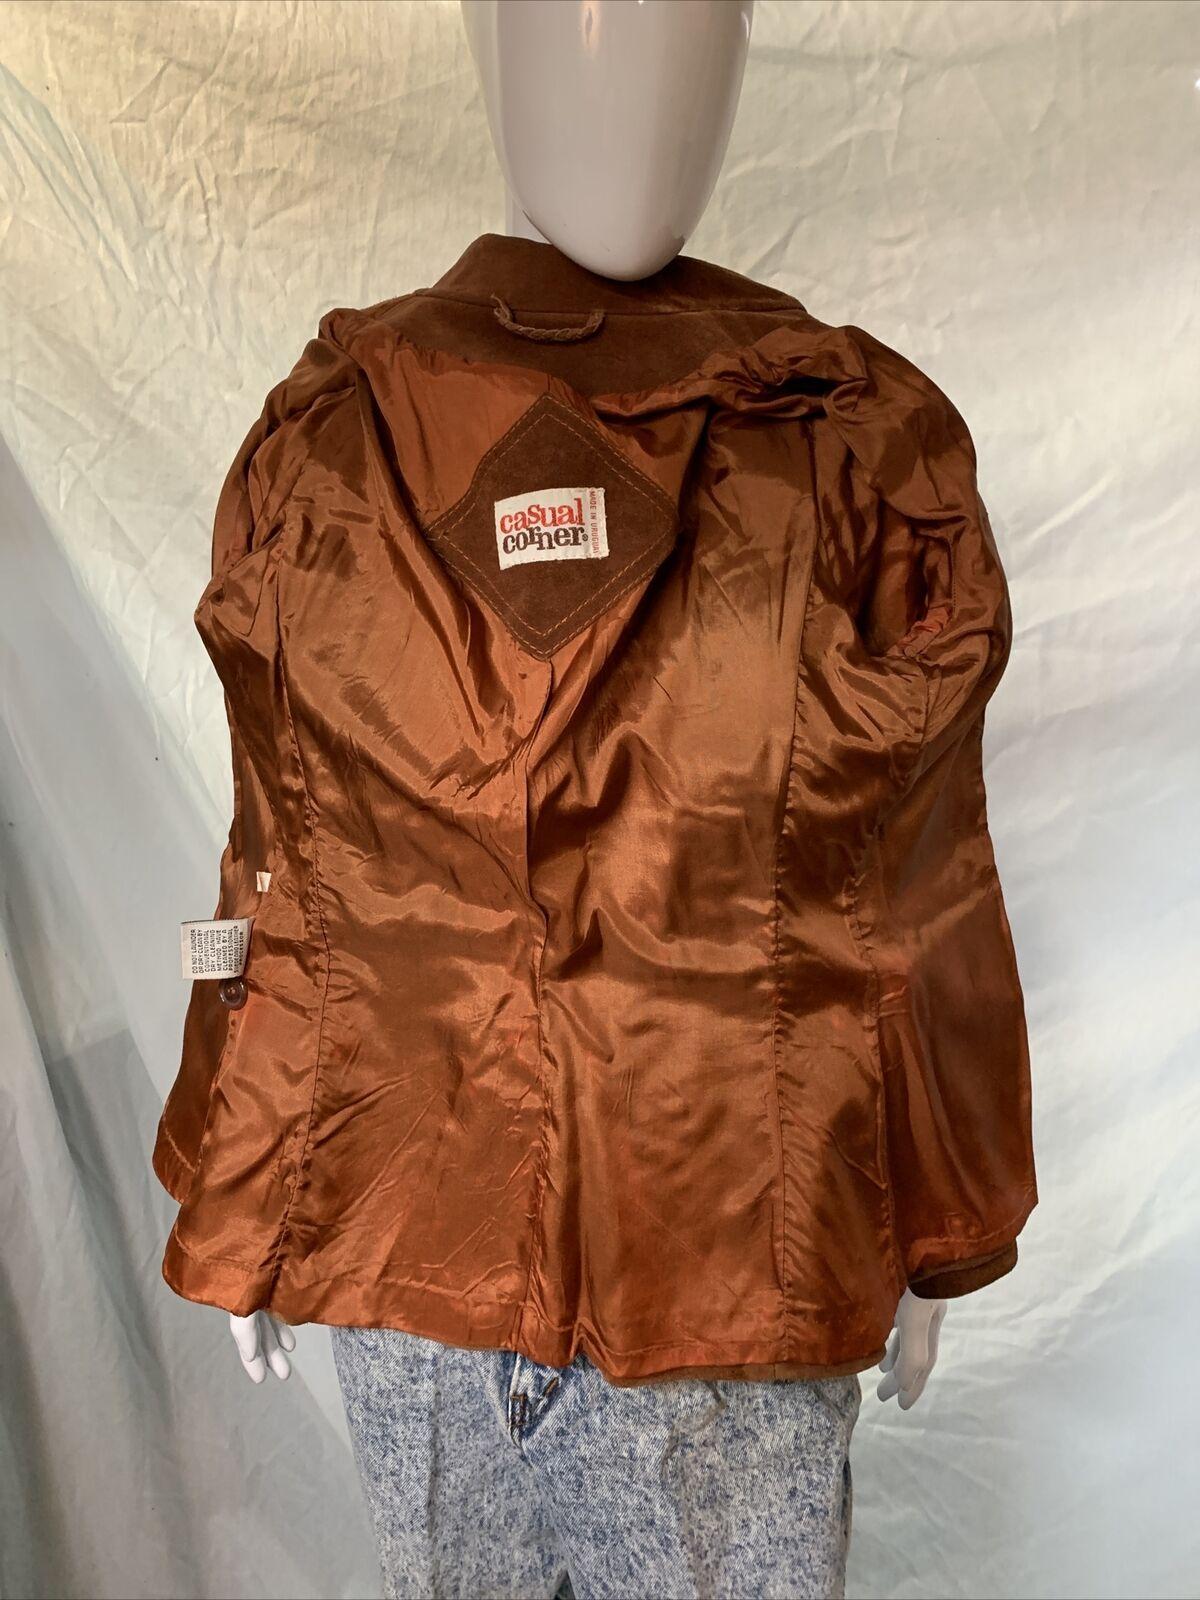 Vintage 1970s Casual Corner Leather Suede Brown J… - image 7